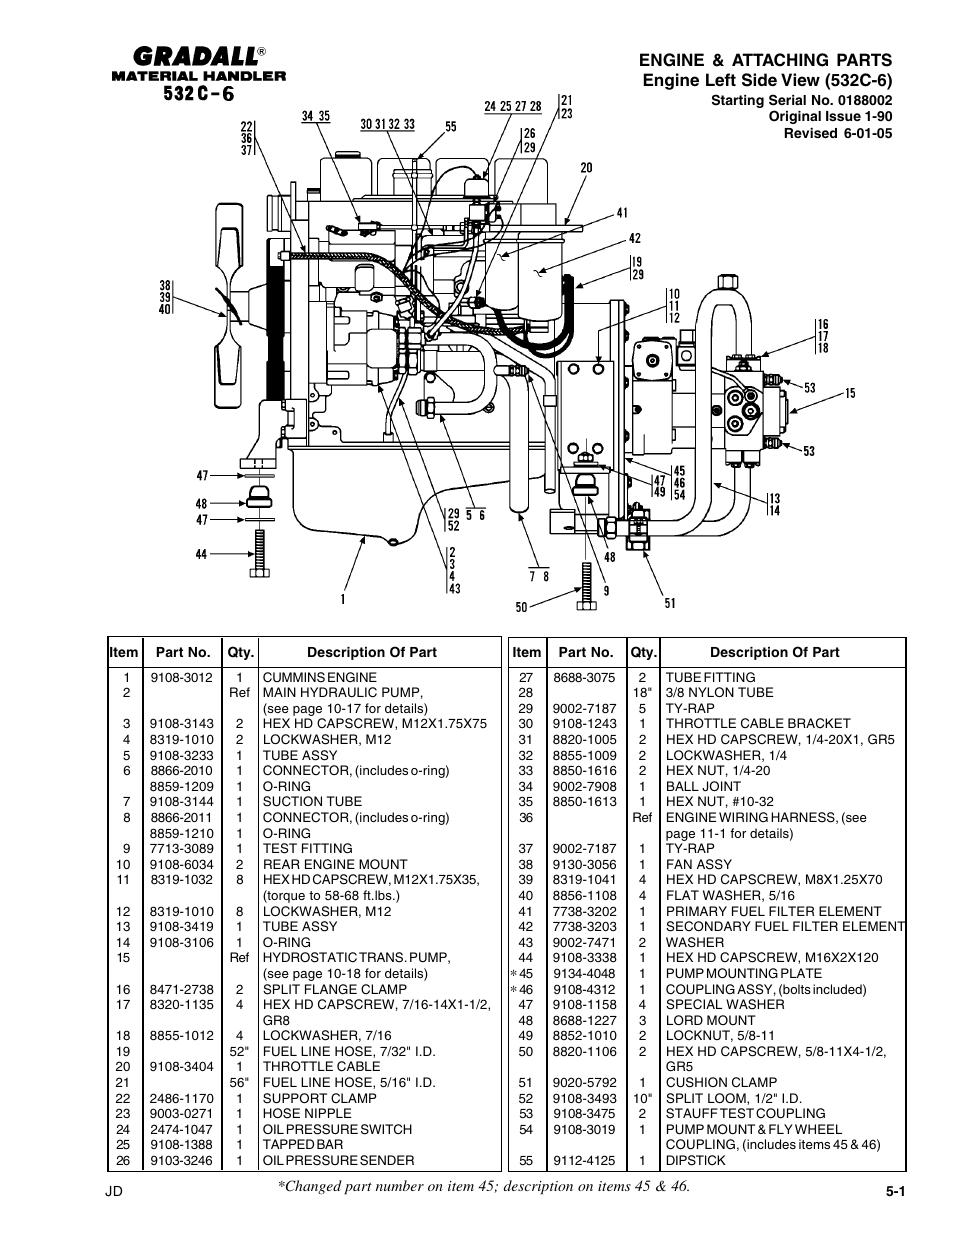 Vda 63 Manual